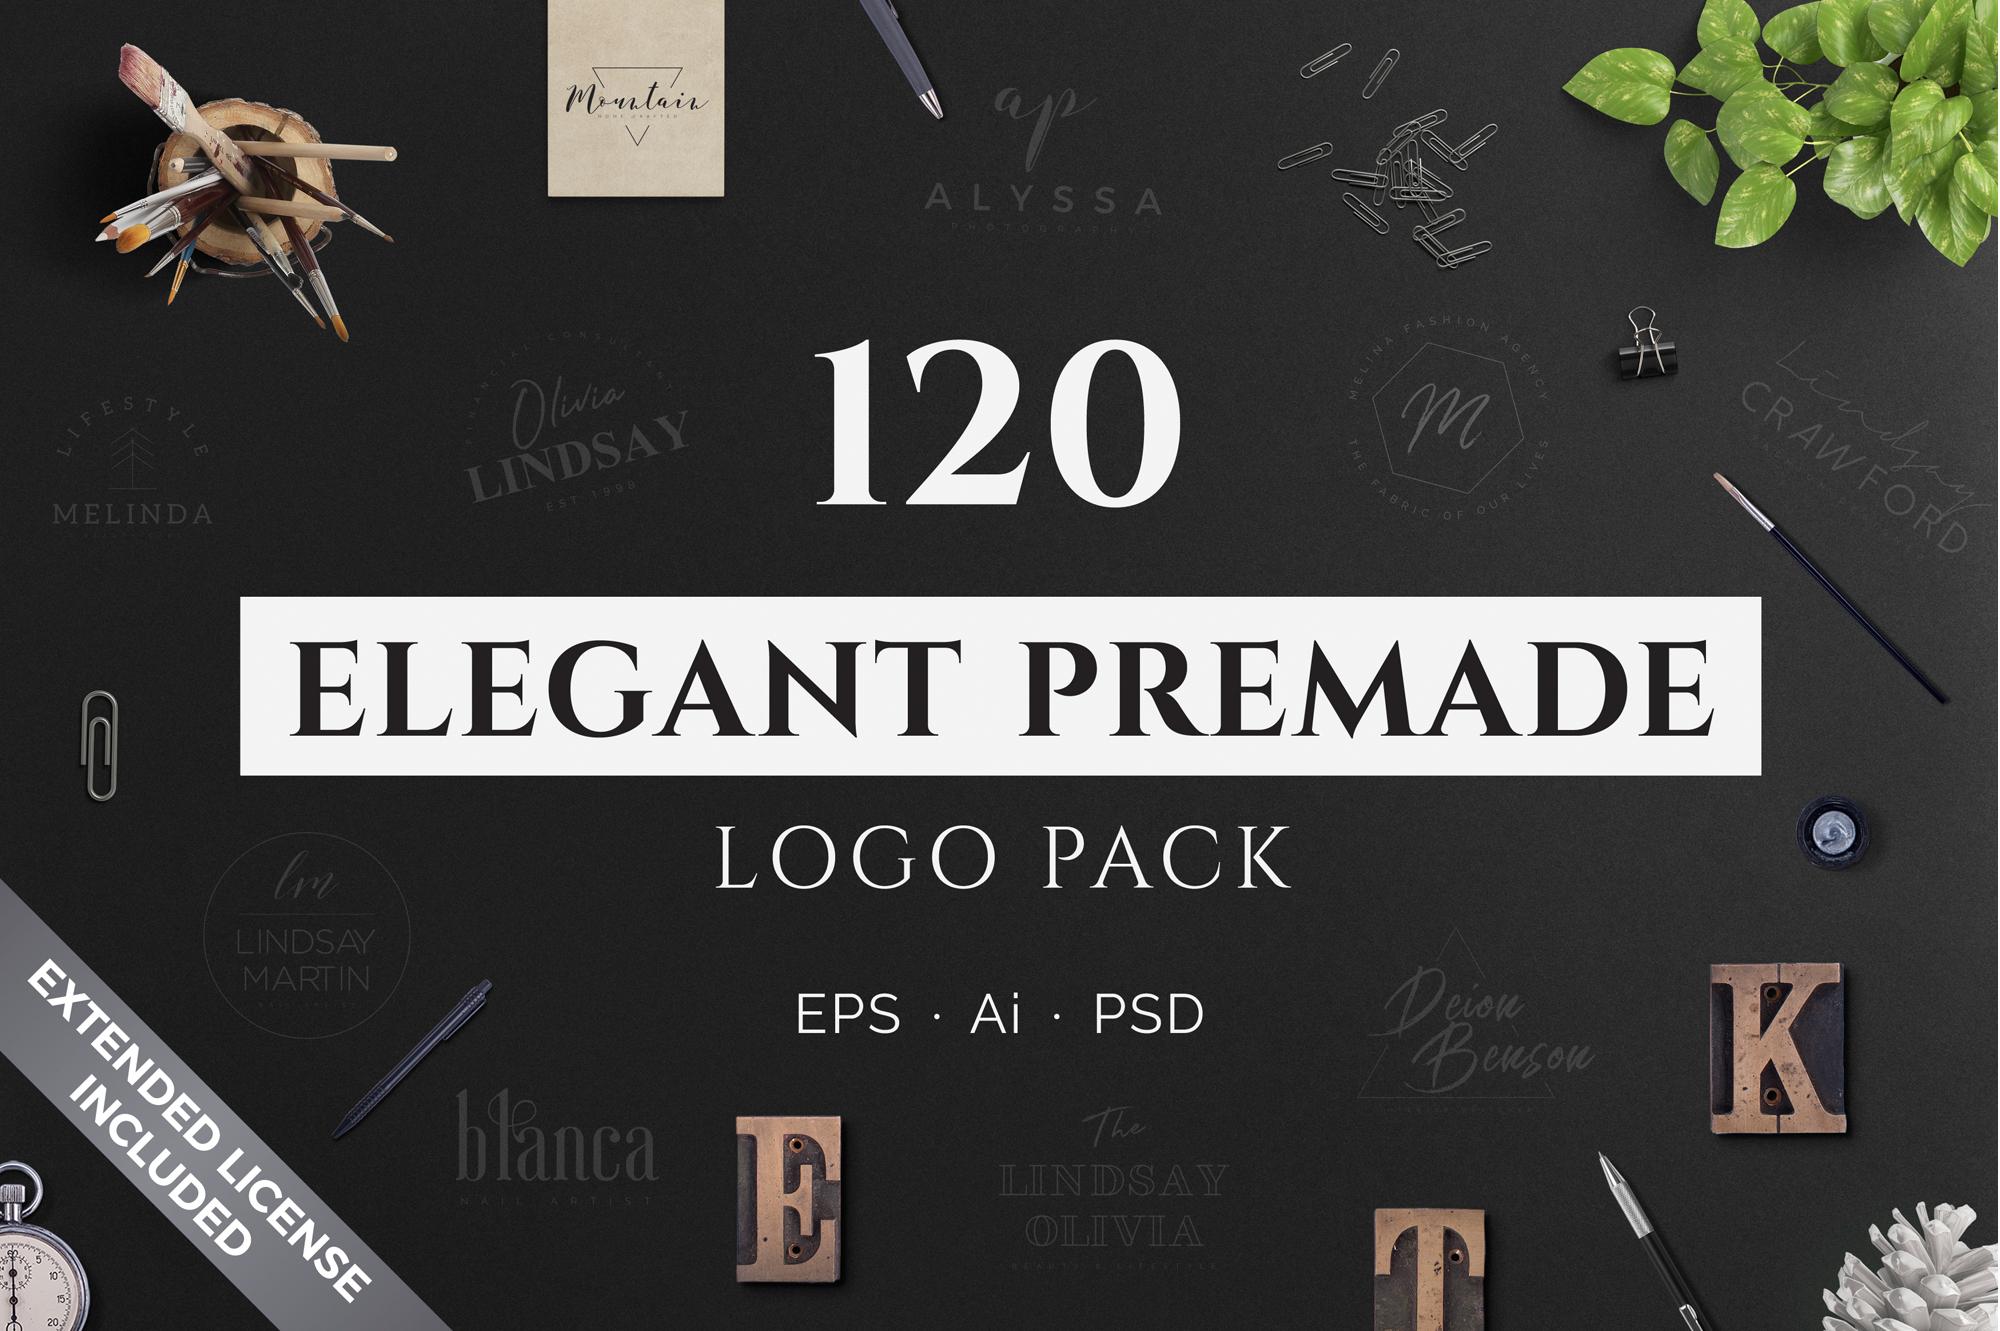 640 Premade Logos Mega Bundle example image 3